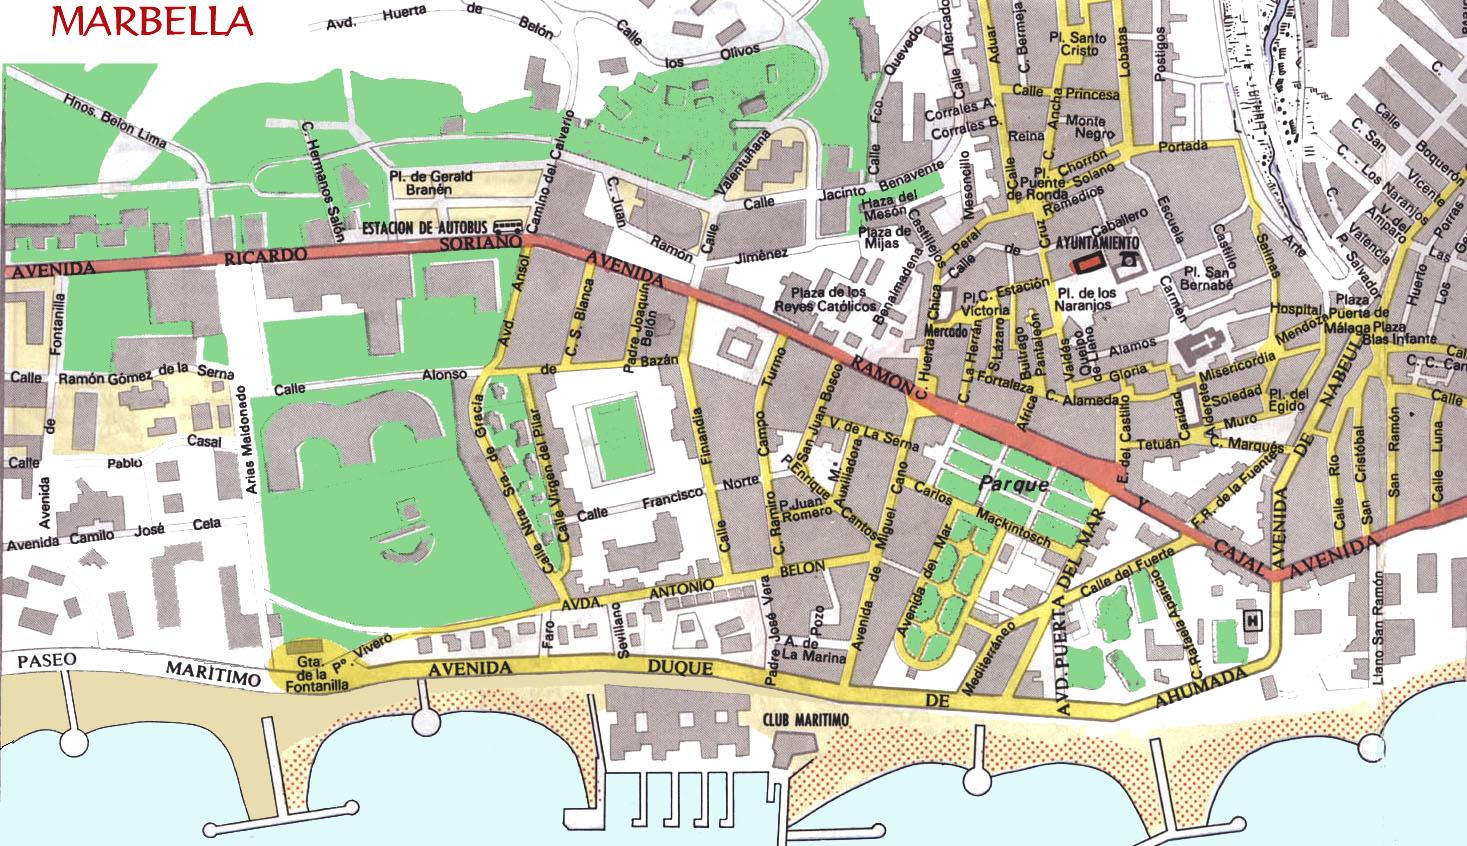 marbella mapa Large Marbella Maps for Free Download and Print | High Resolution  marbella mapa